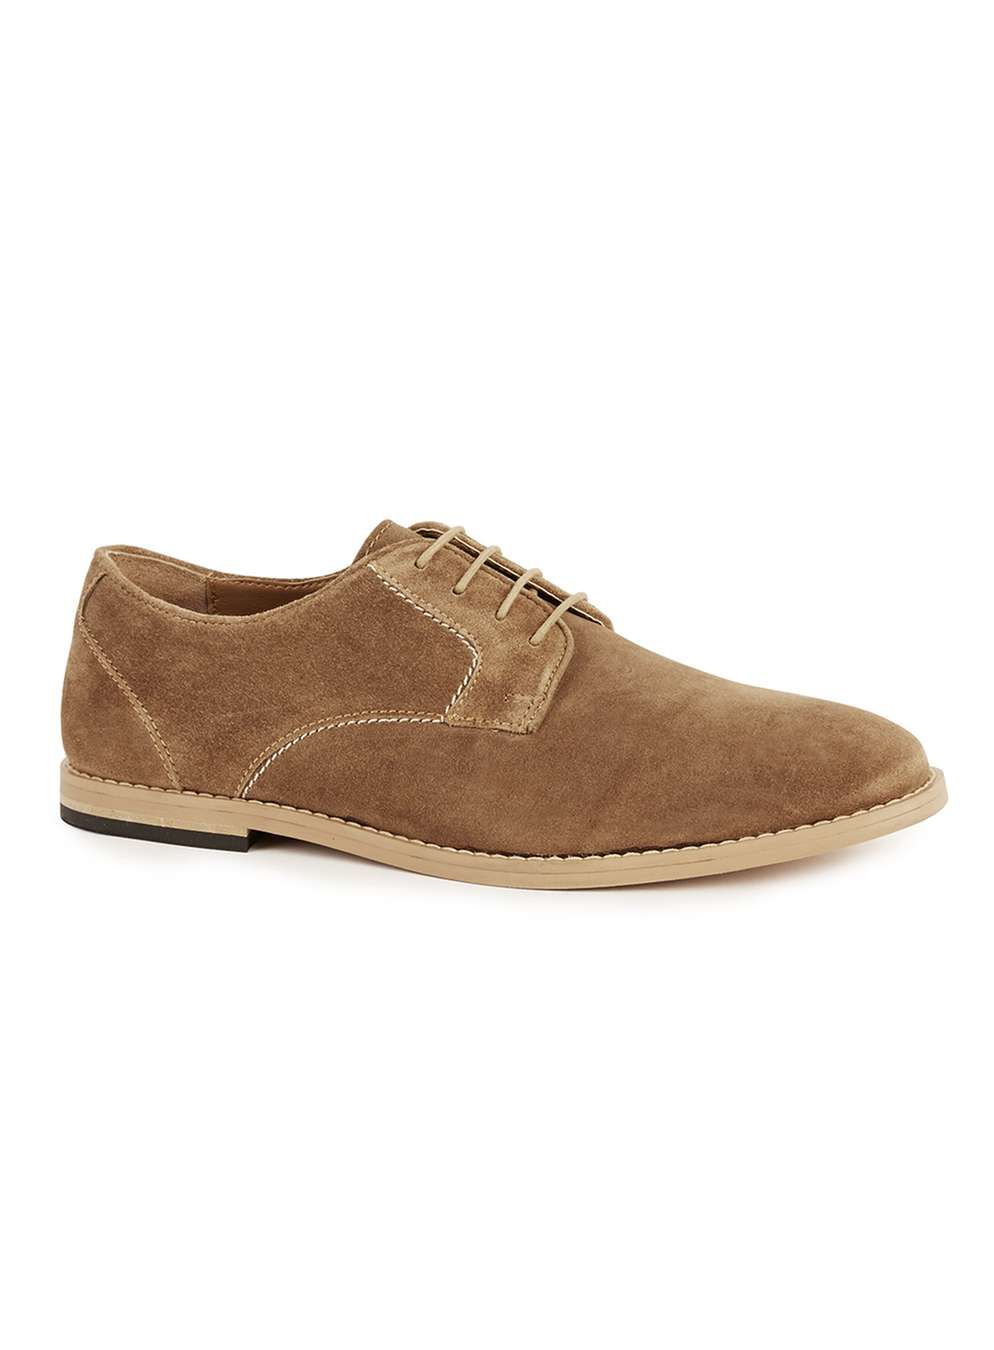 Topman Shoes Suede Brogues